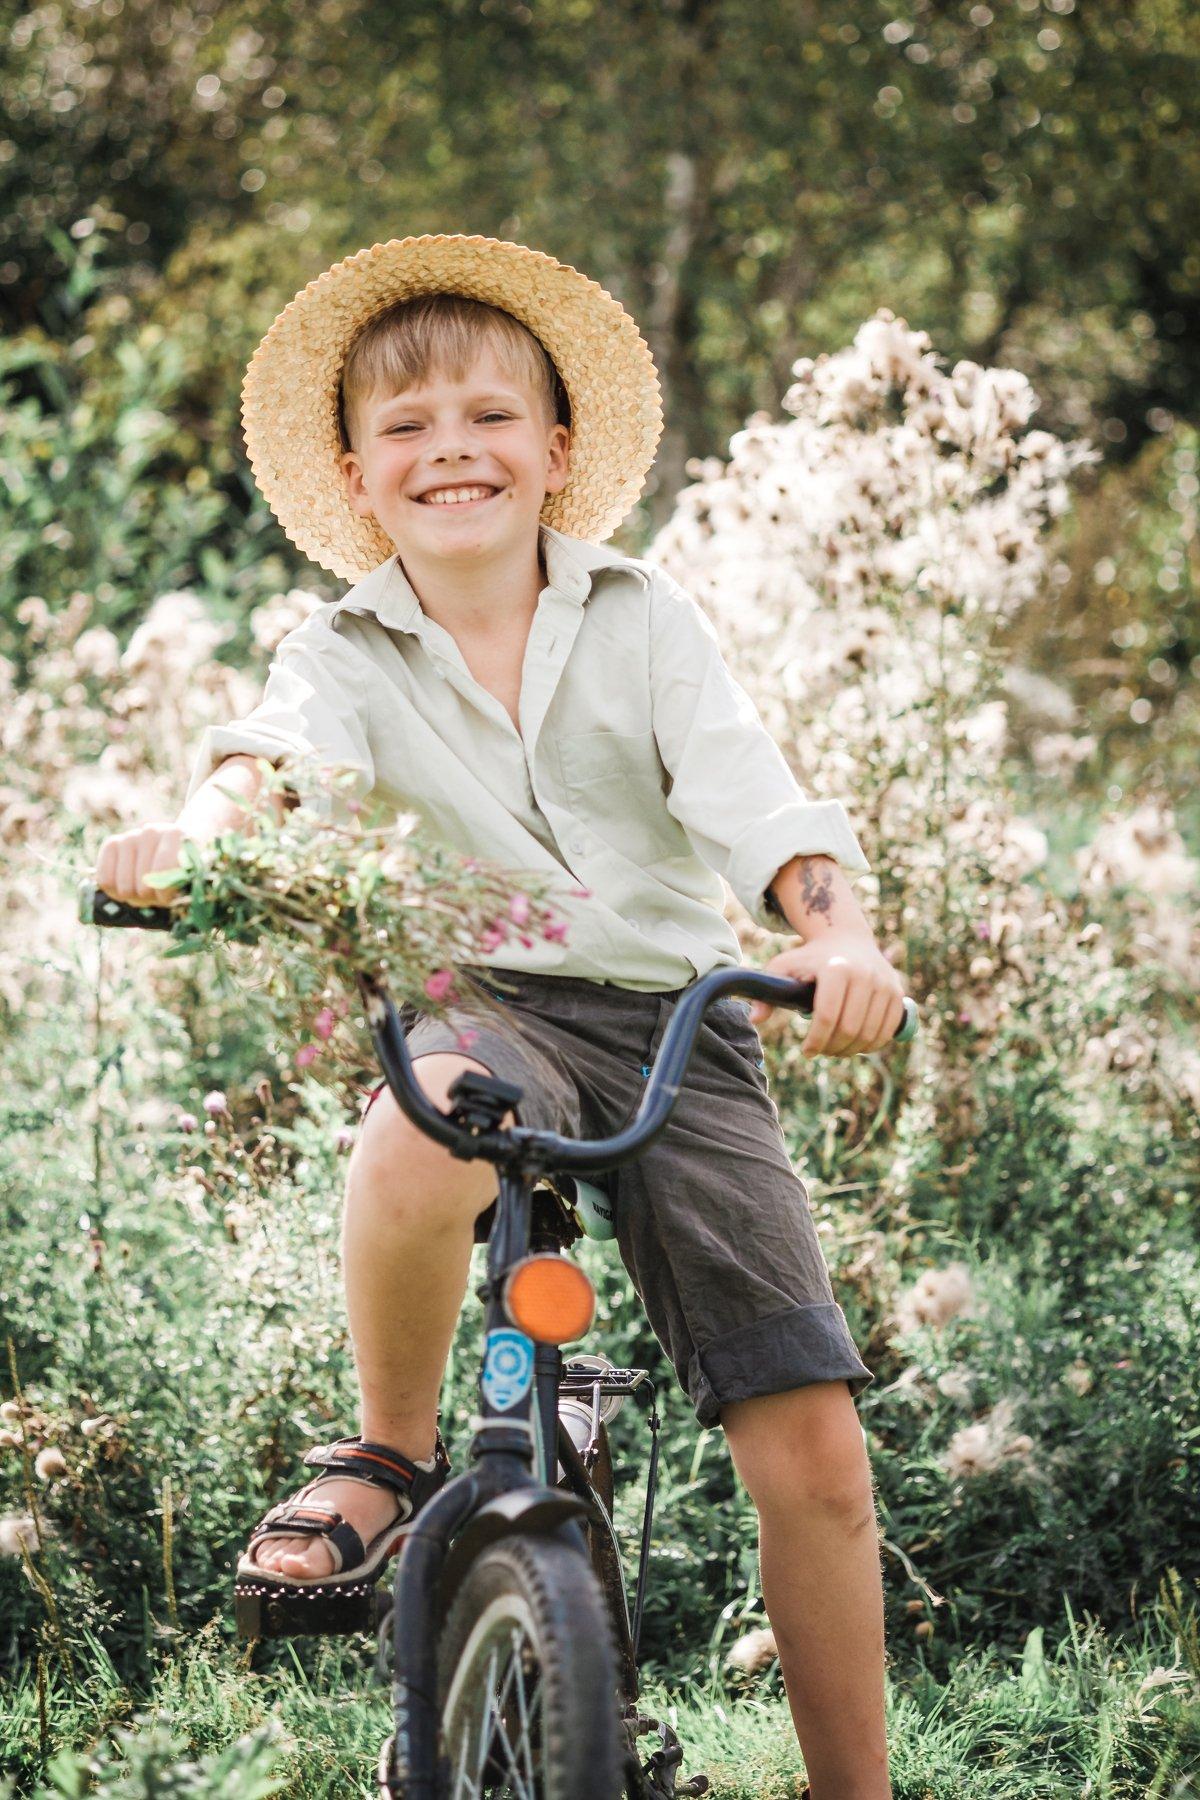 лето bike happiness boy summer portrait annromanovska smile, Ann Romanovska